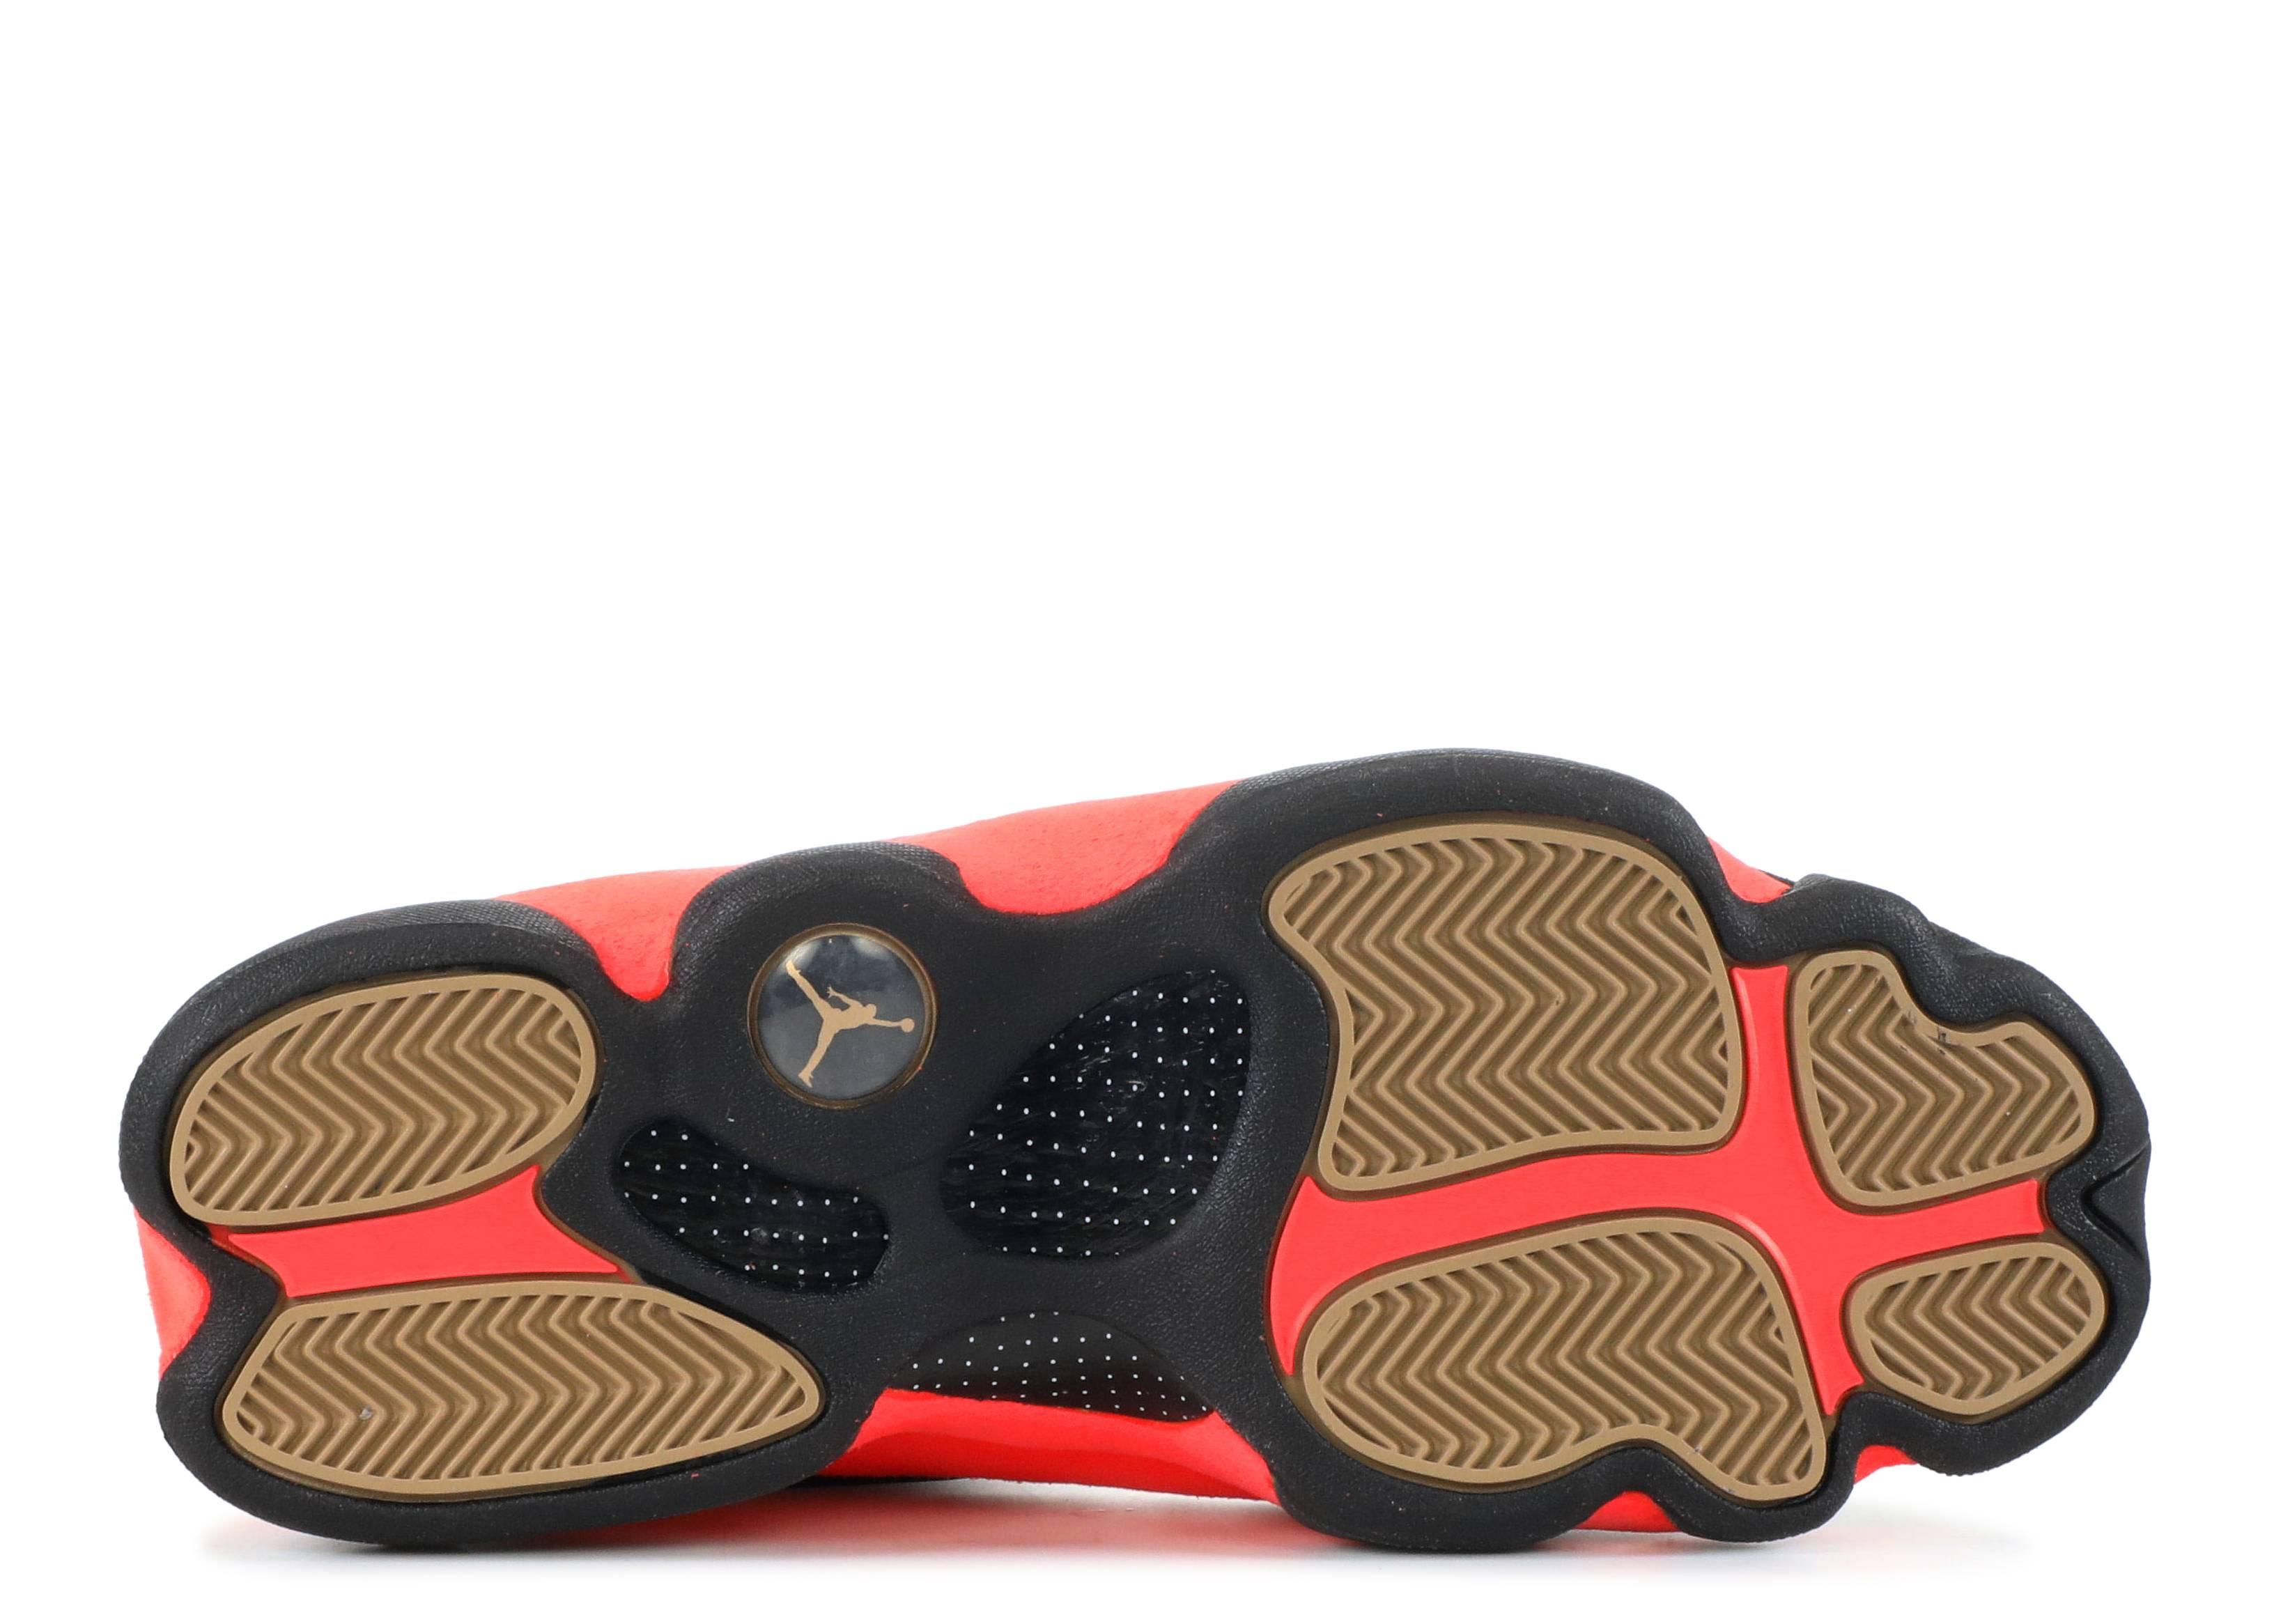 outlet store 9c94f 0268b Air Jordan 13 Retro Low Nrg ct